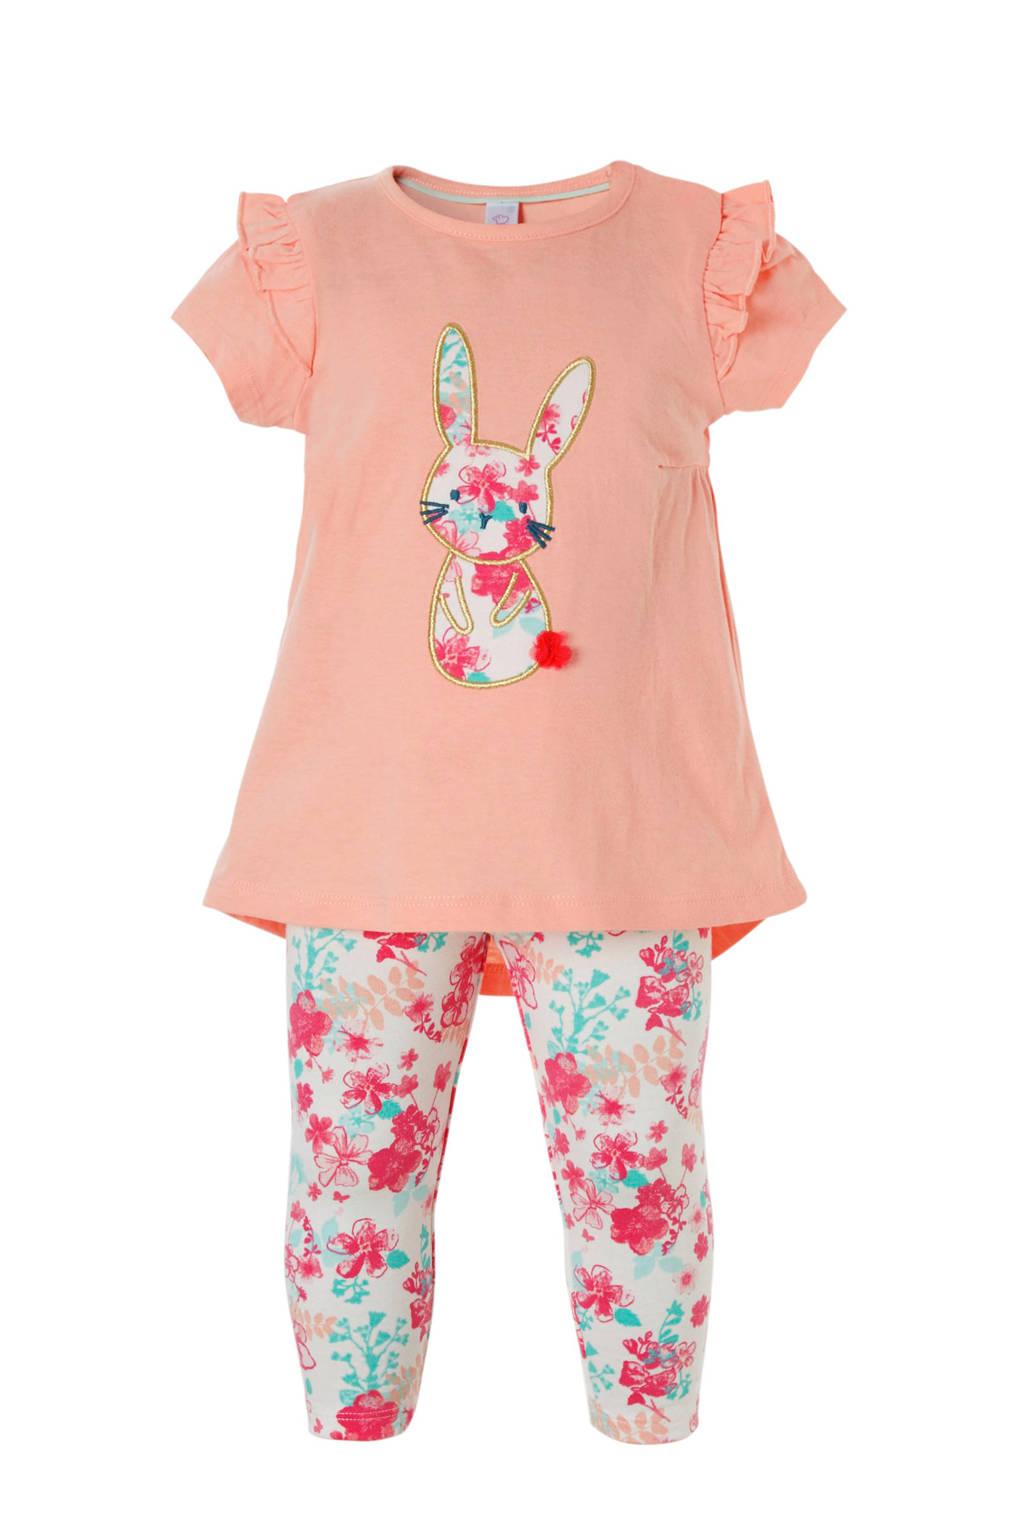 C&A Baby Club jurk + legging + hoofdband, Roze